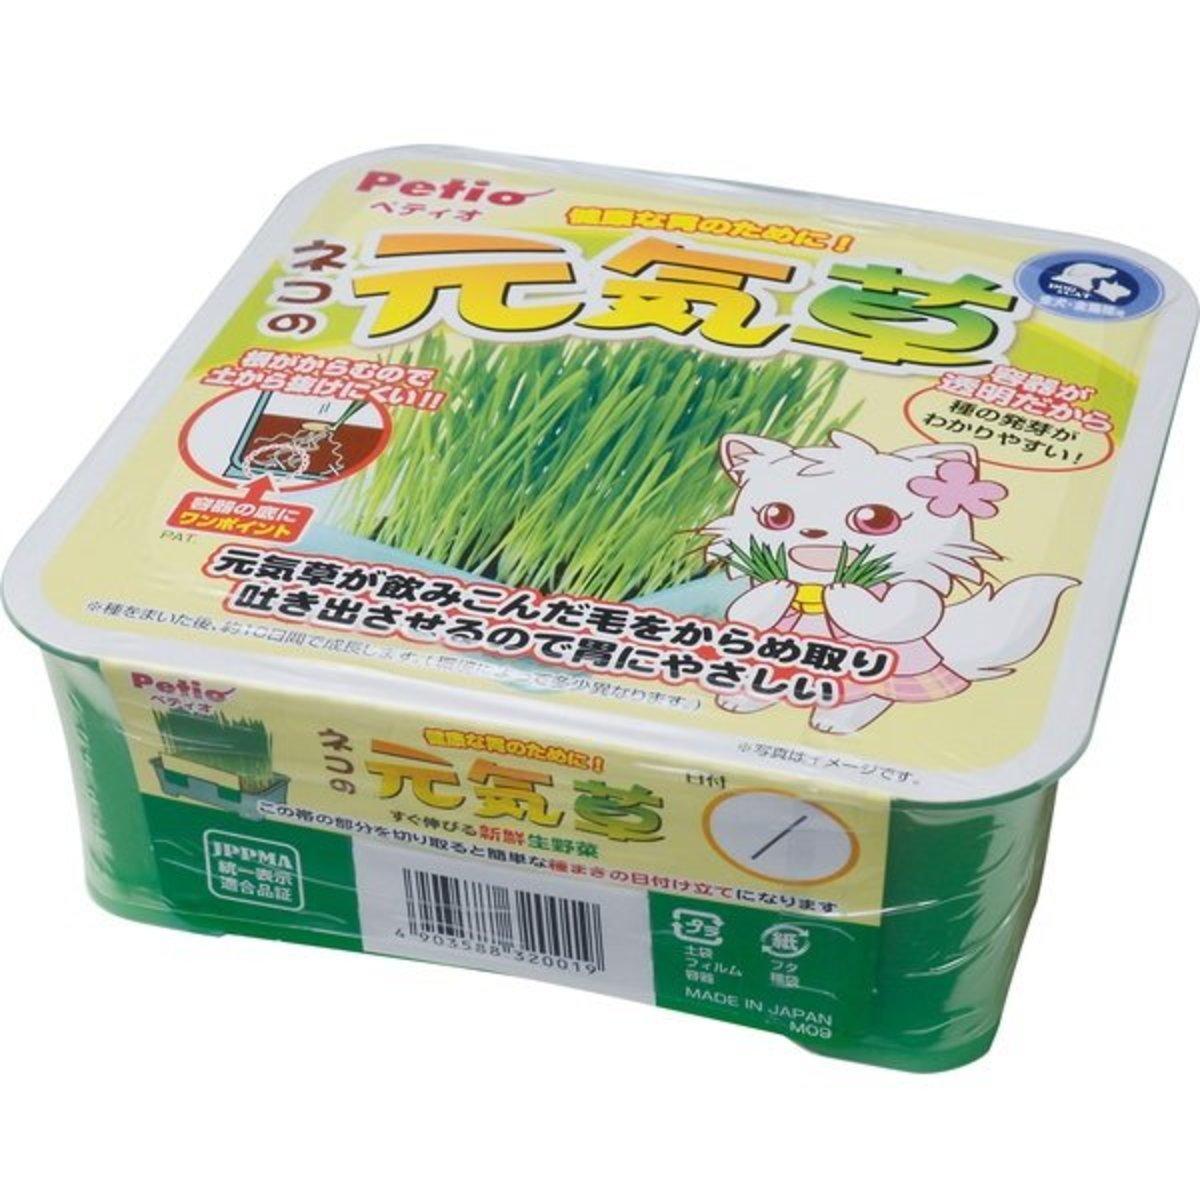 Japan Healthy Cat Grass